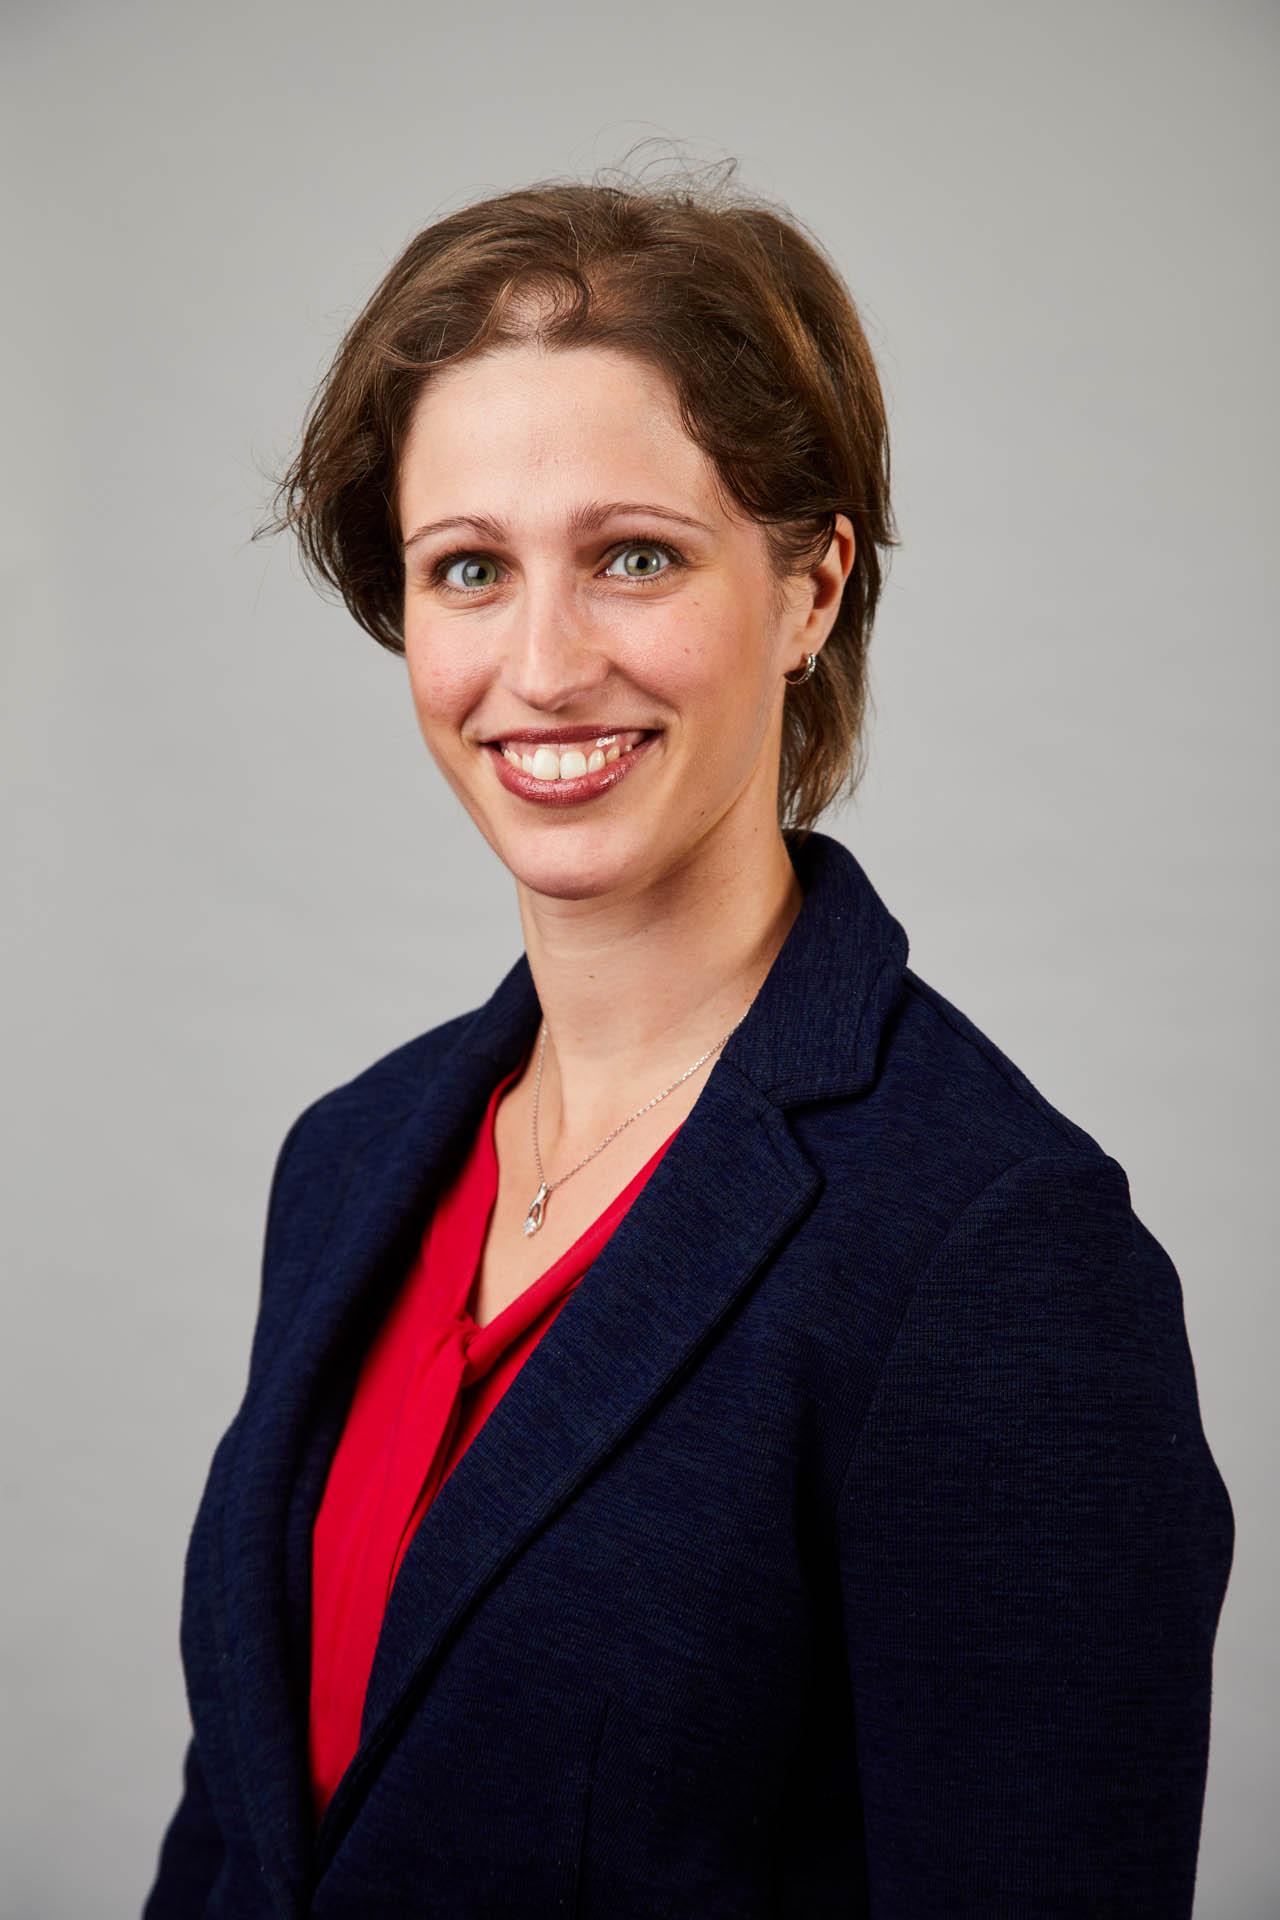 Katja Bosman